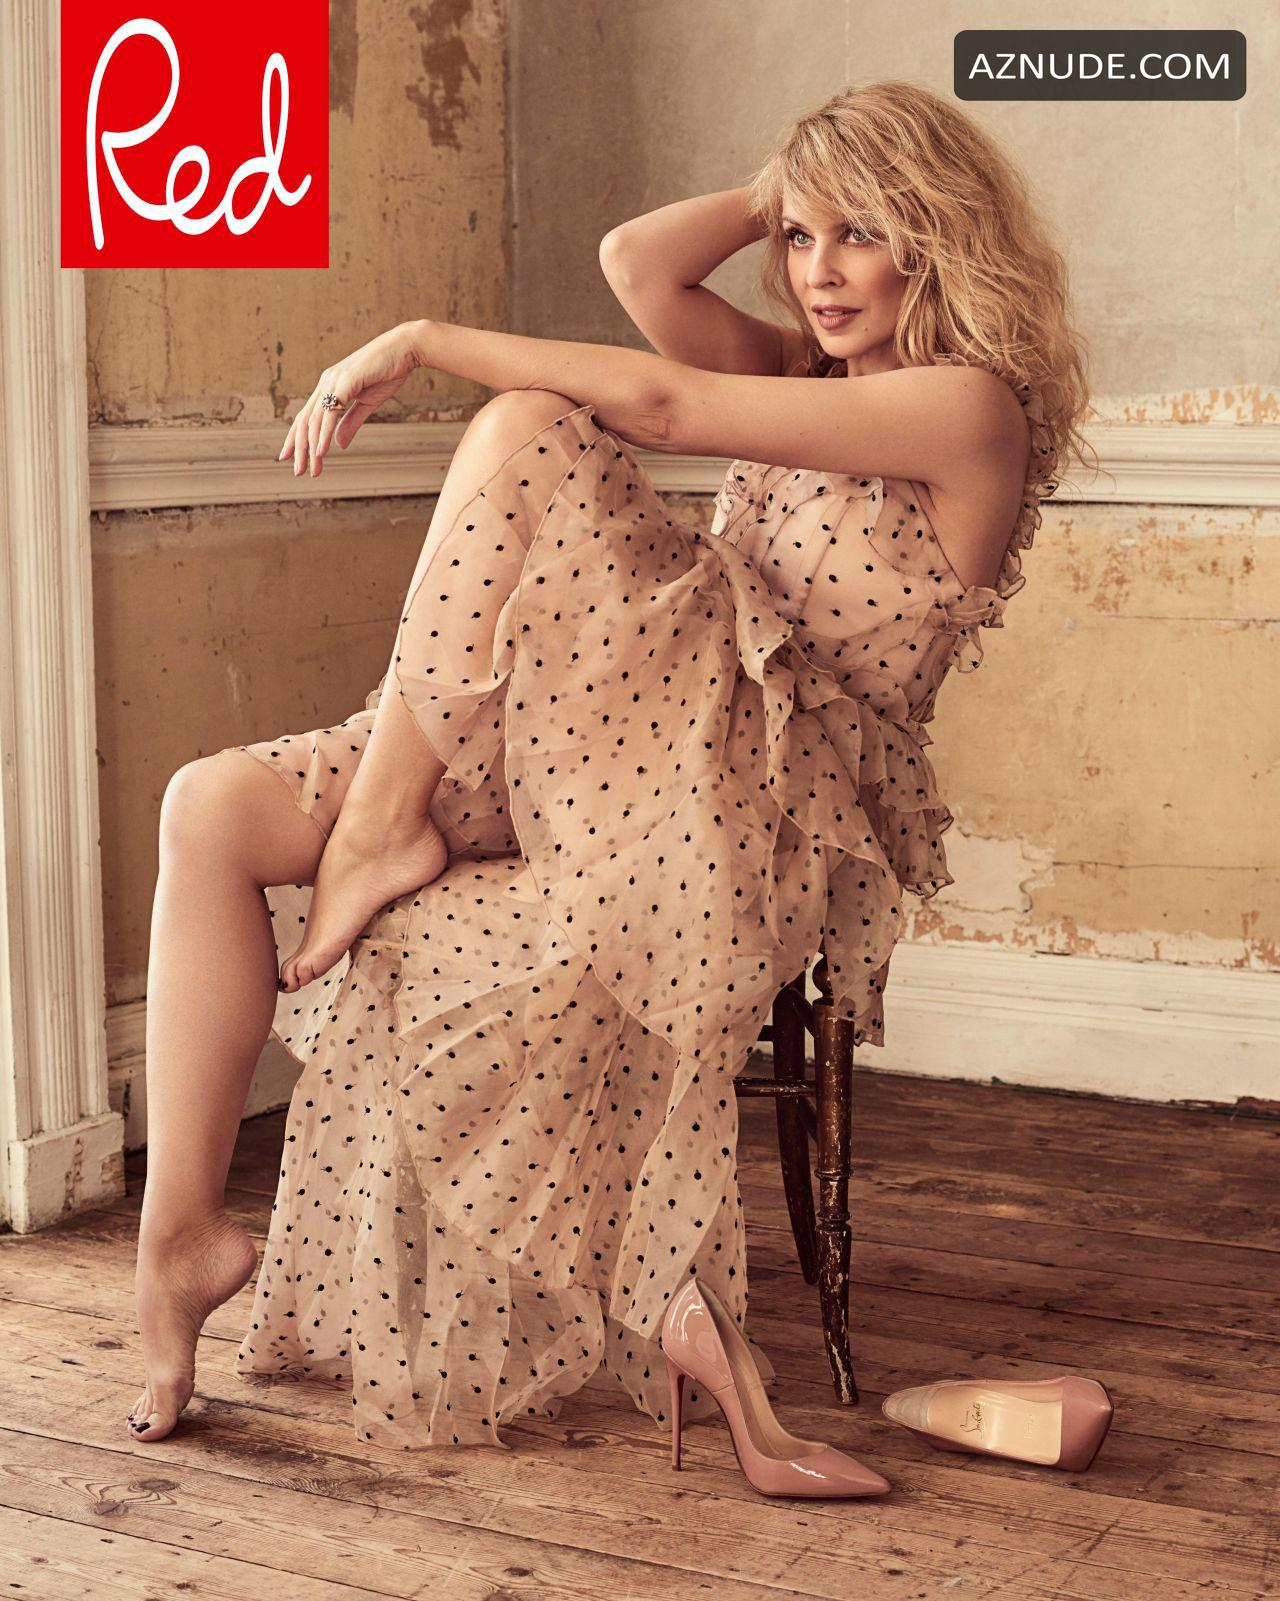 Kylie minogue nuda hot photos 386